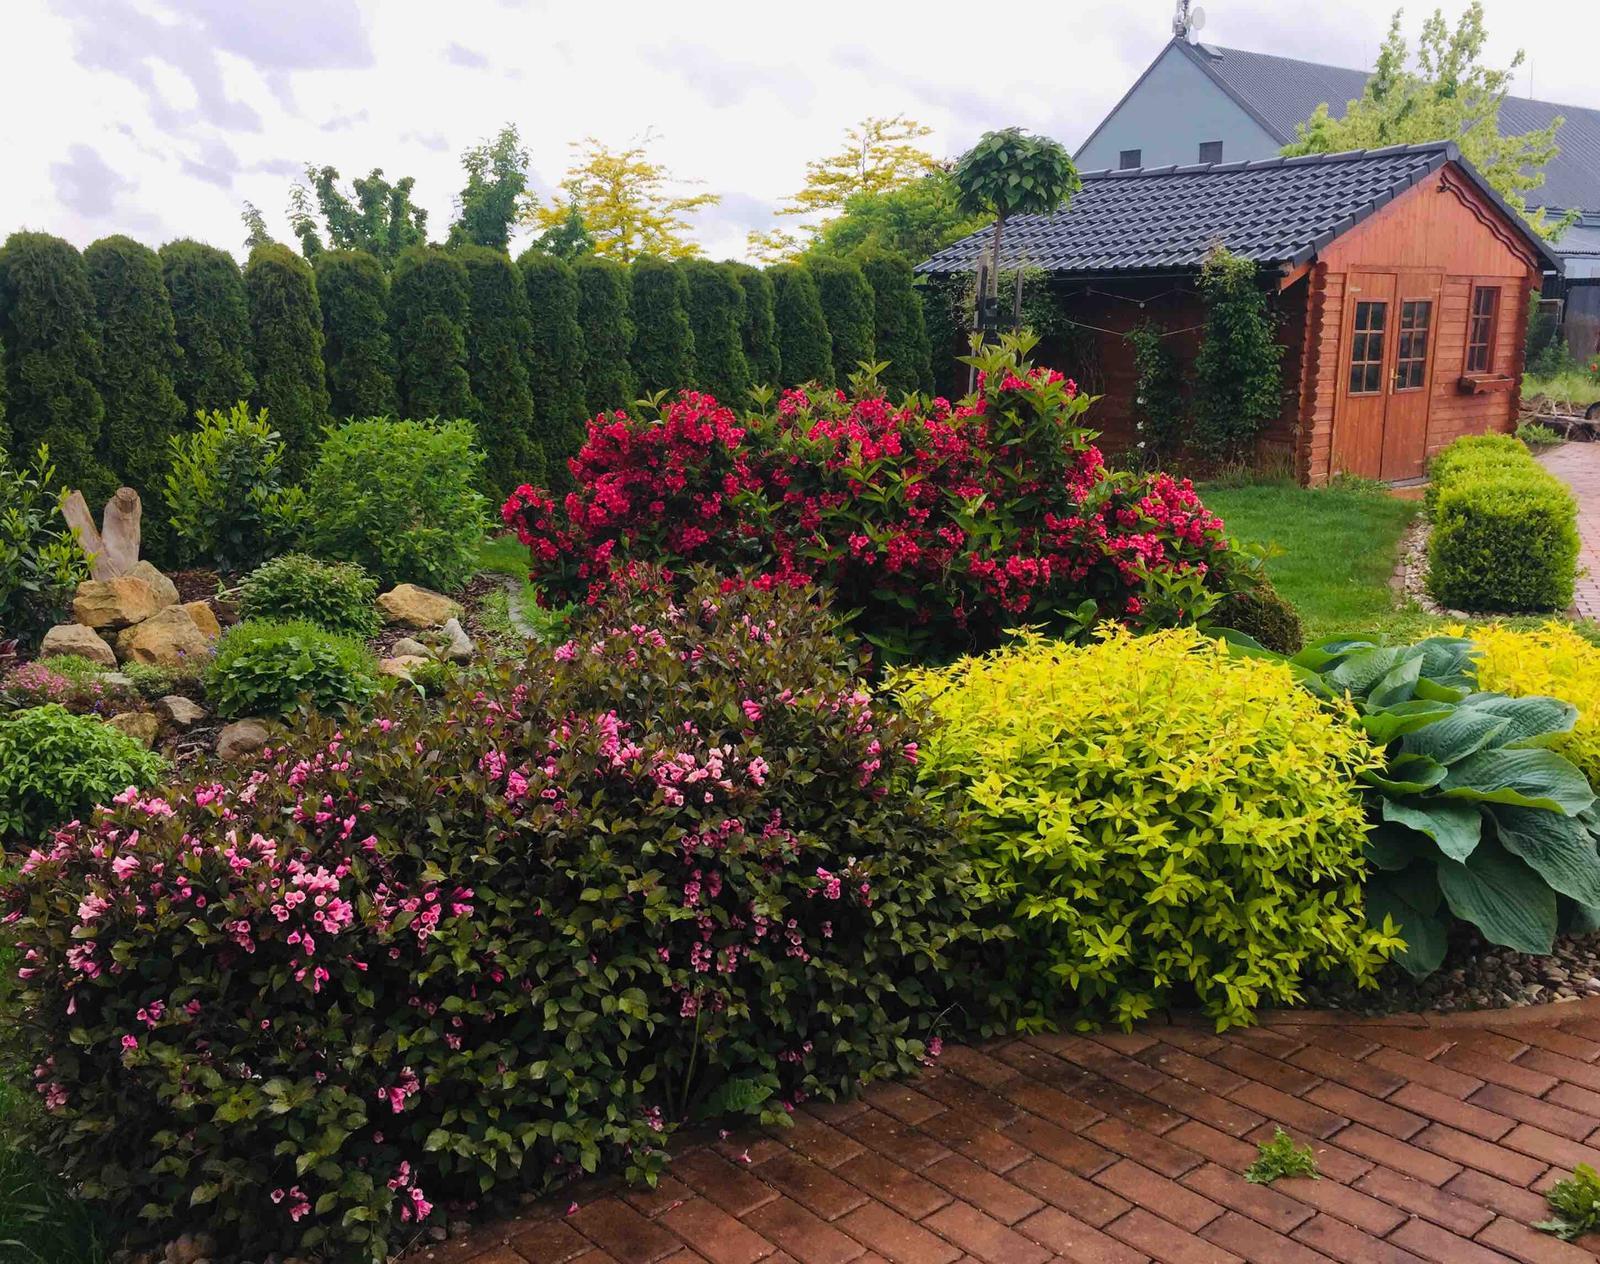 Naše barevná zahrada 🌸 rok 2020 - I když je zataženo, tak v zahradě to hraje barvami 🌸